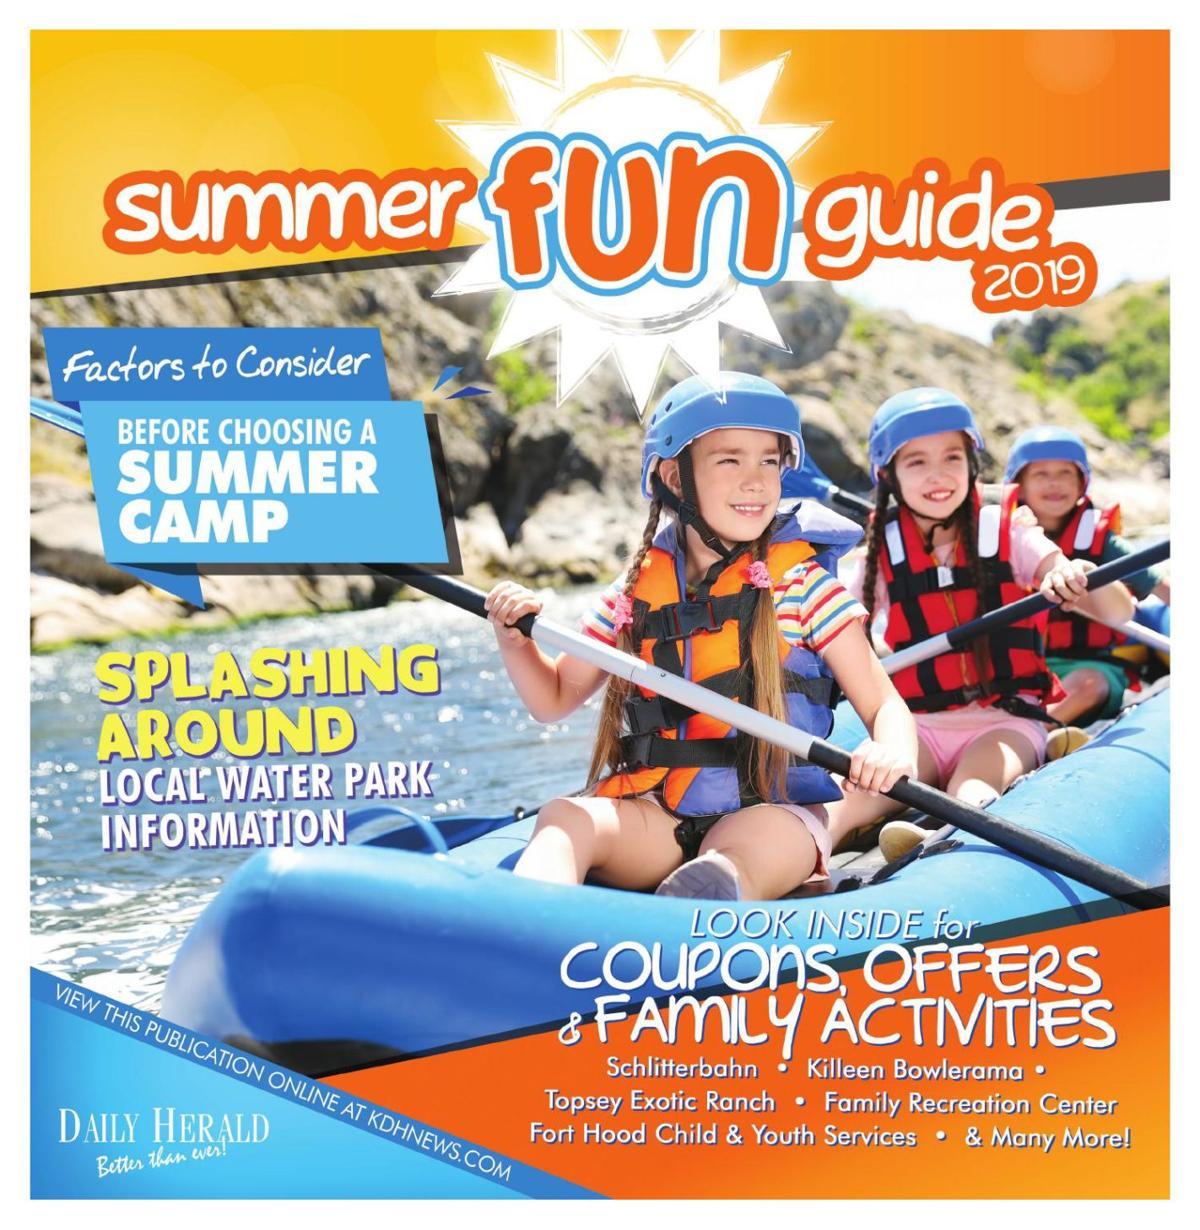 Summer Fun Guide 2019